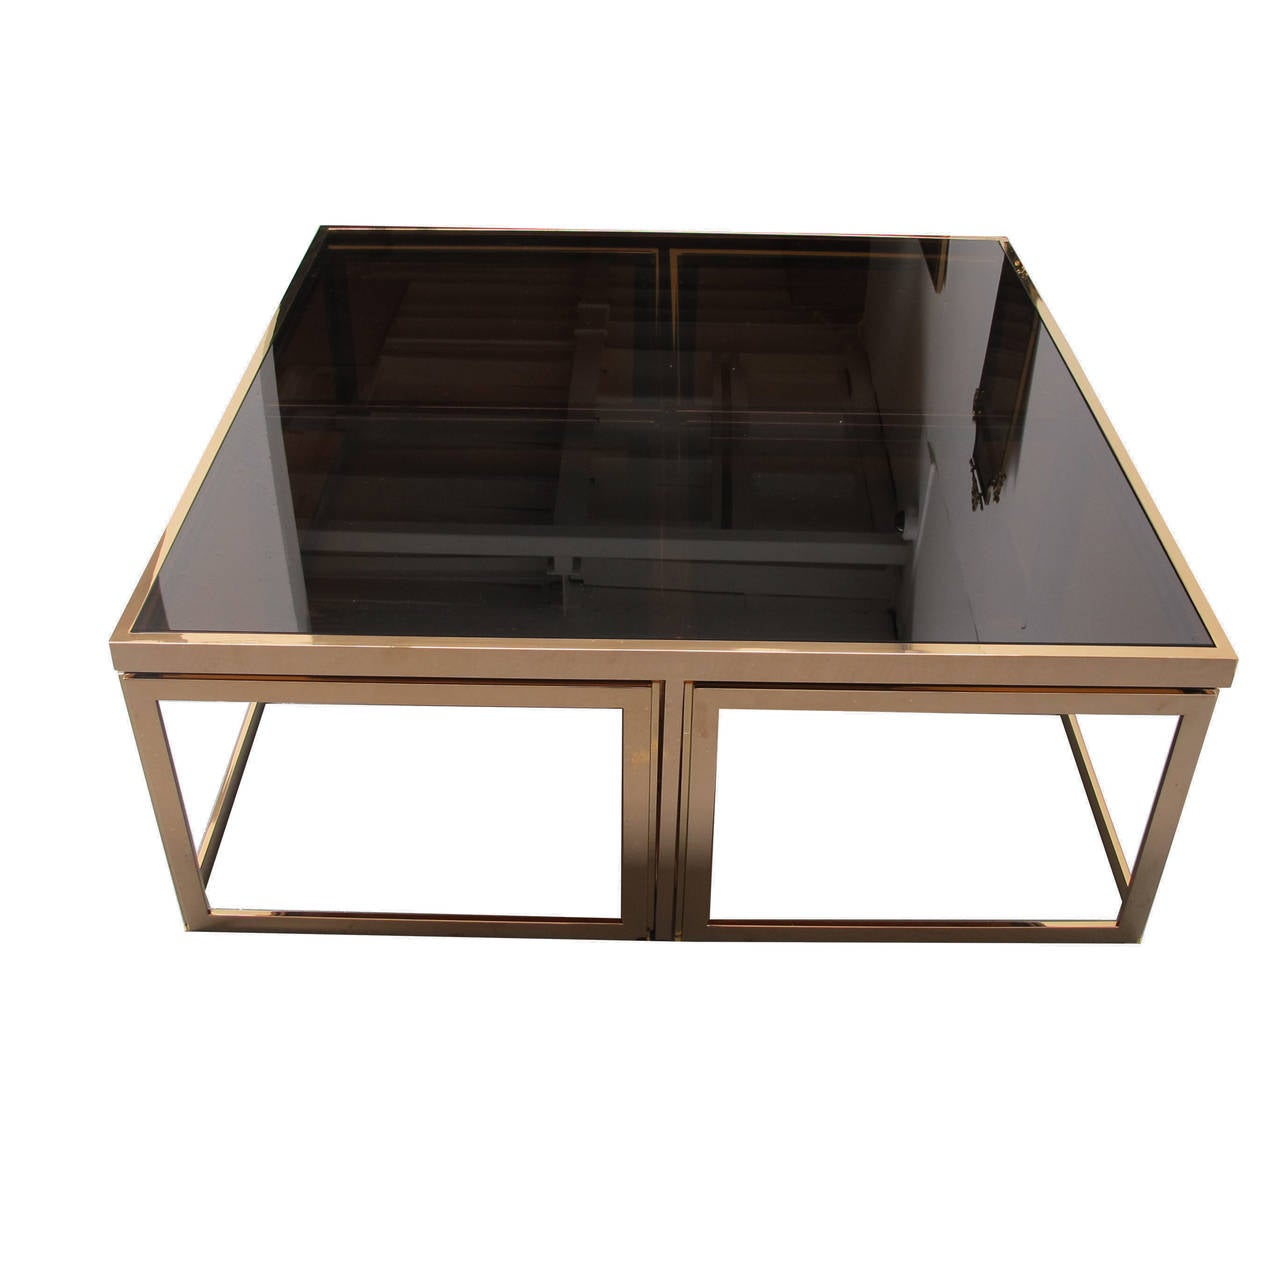 modular coffee table image 2 modular coffee table by paul mccobb for sale at 1stdibs